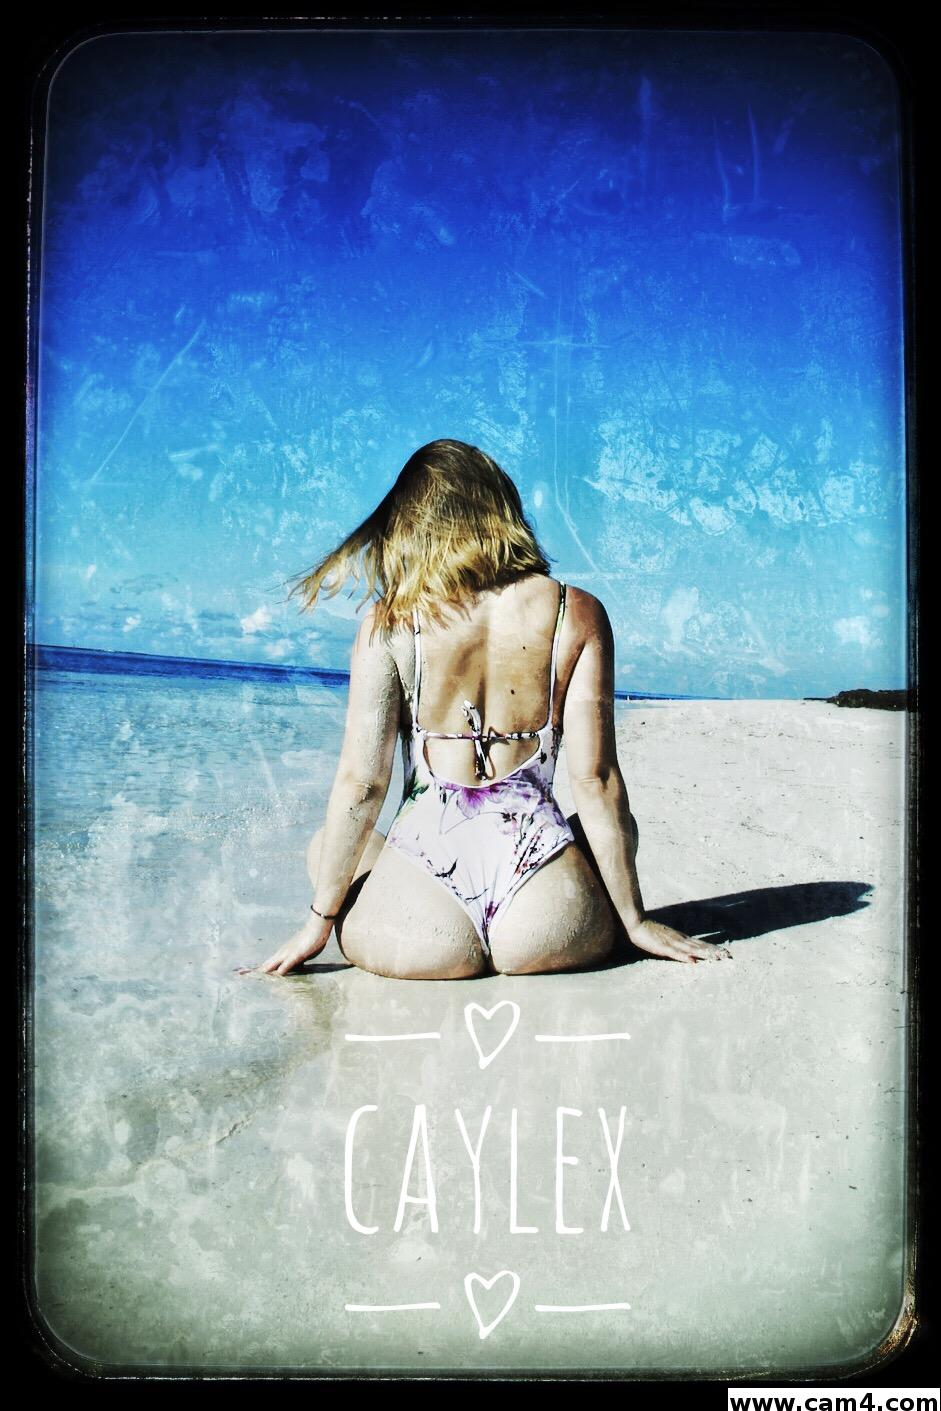 Caylex1?s=unta4z6qpddggjqicsczpbgicyesm2fbh8qwehc4io8=